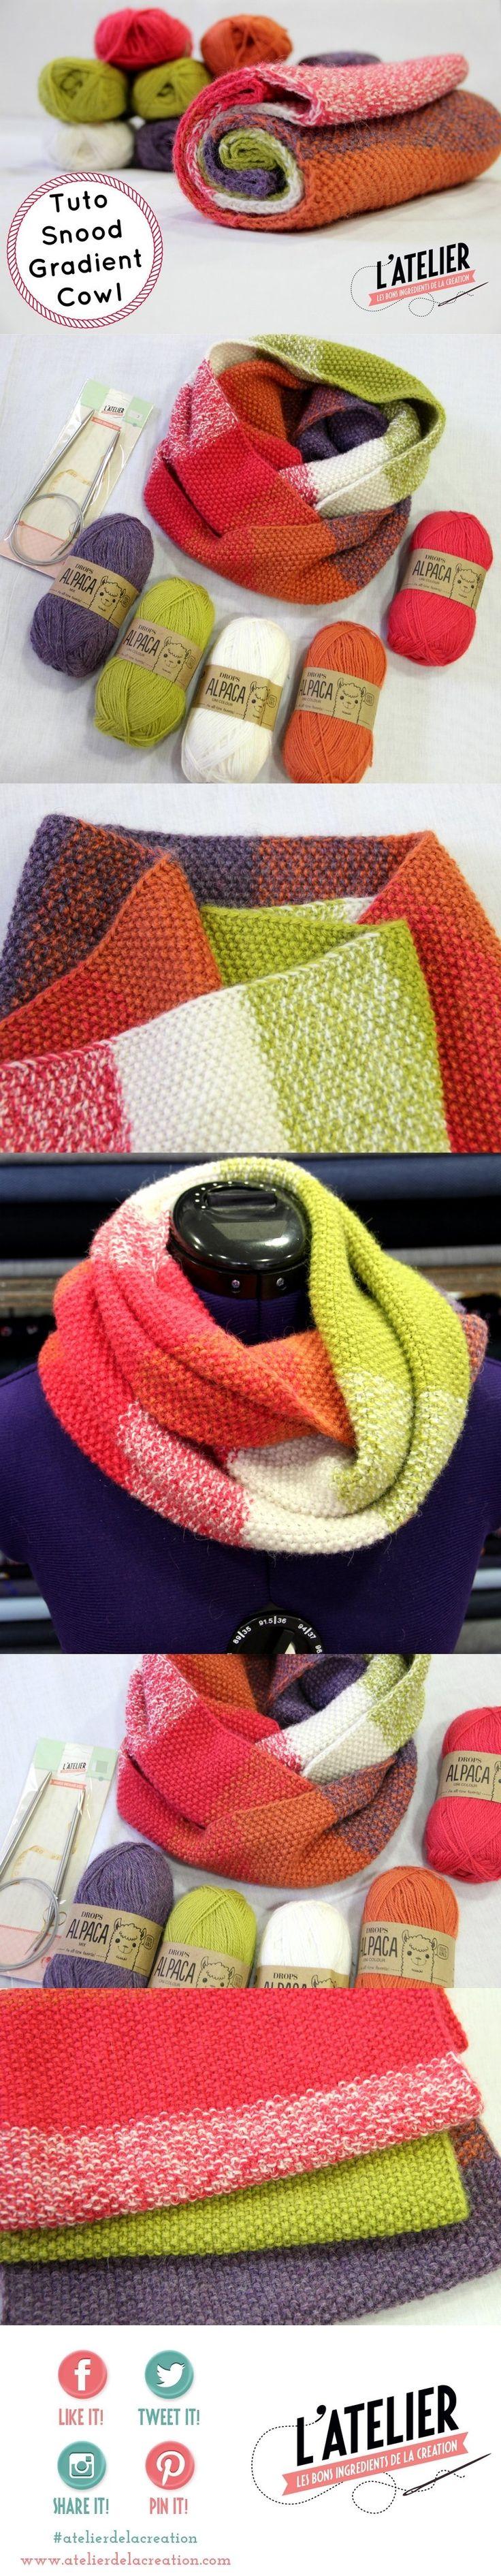 Snood tricot avec explications en français